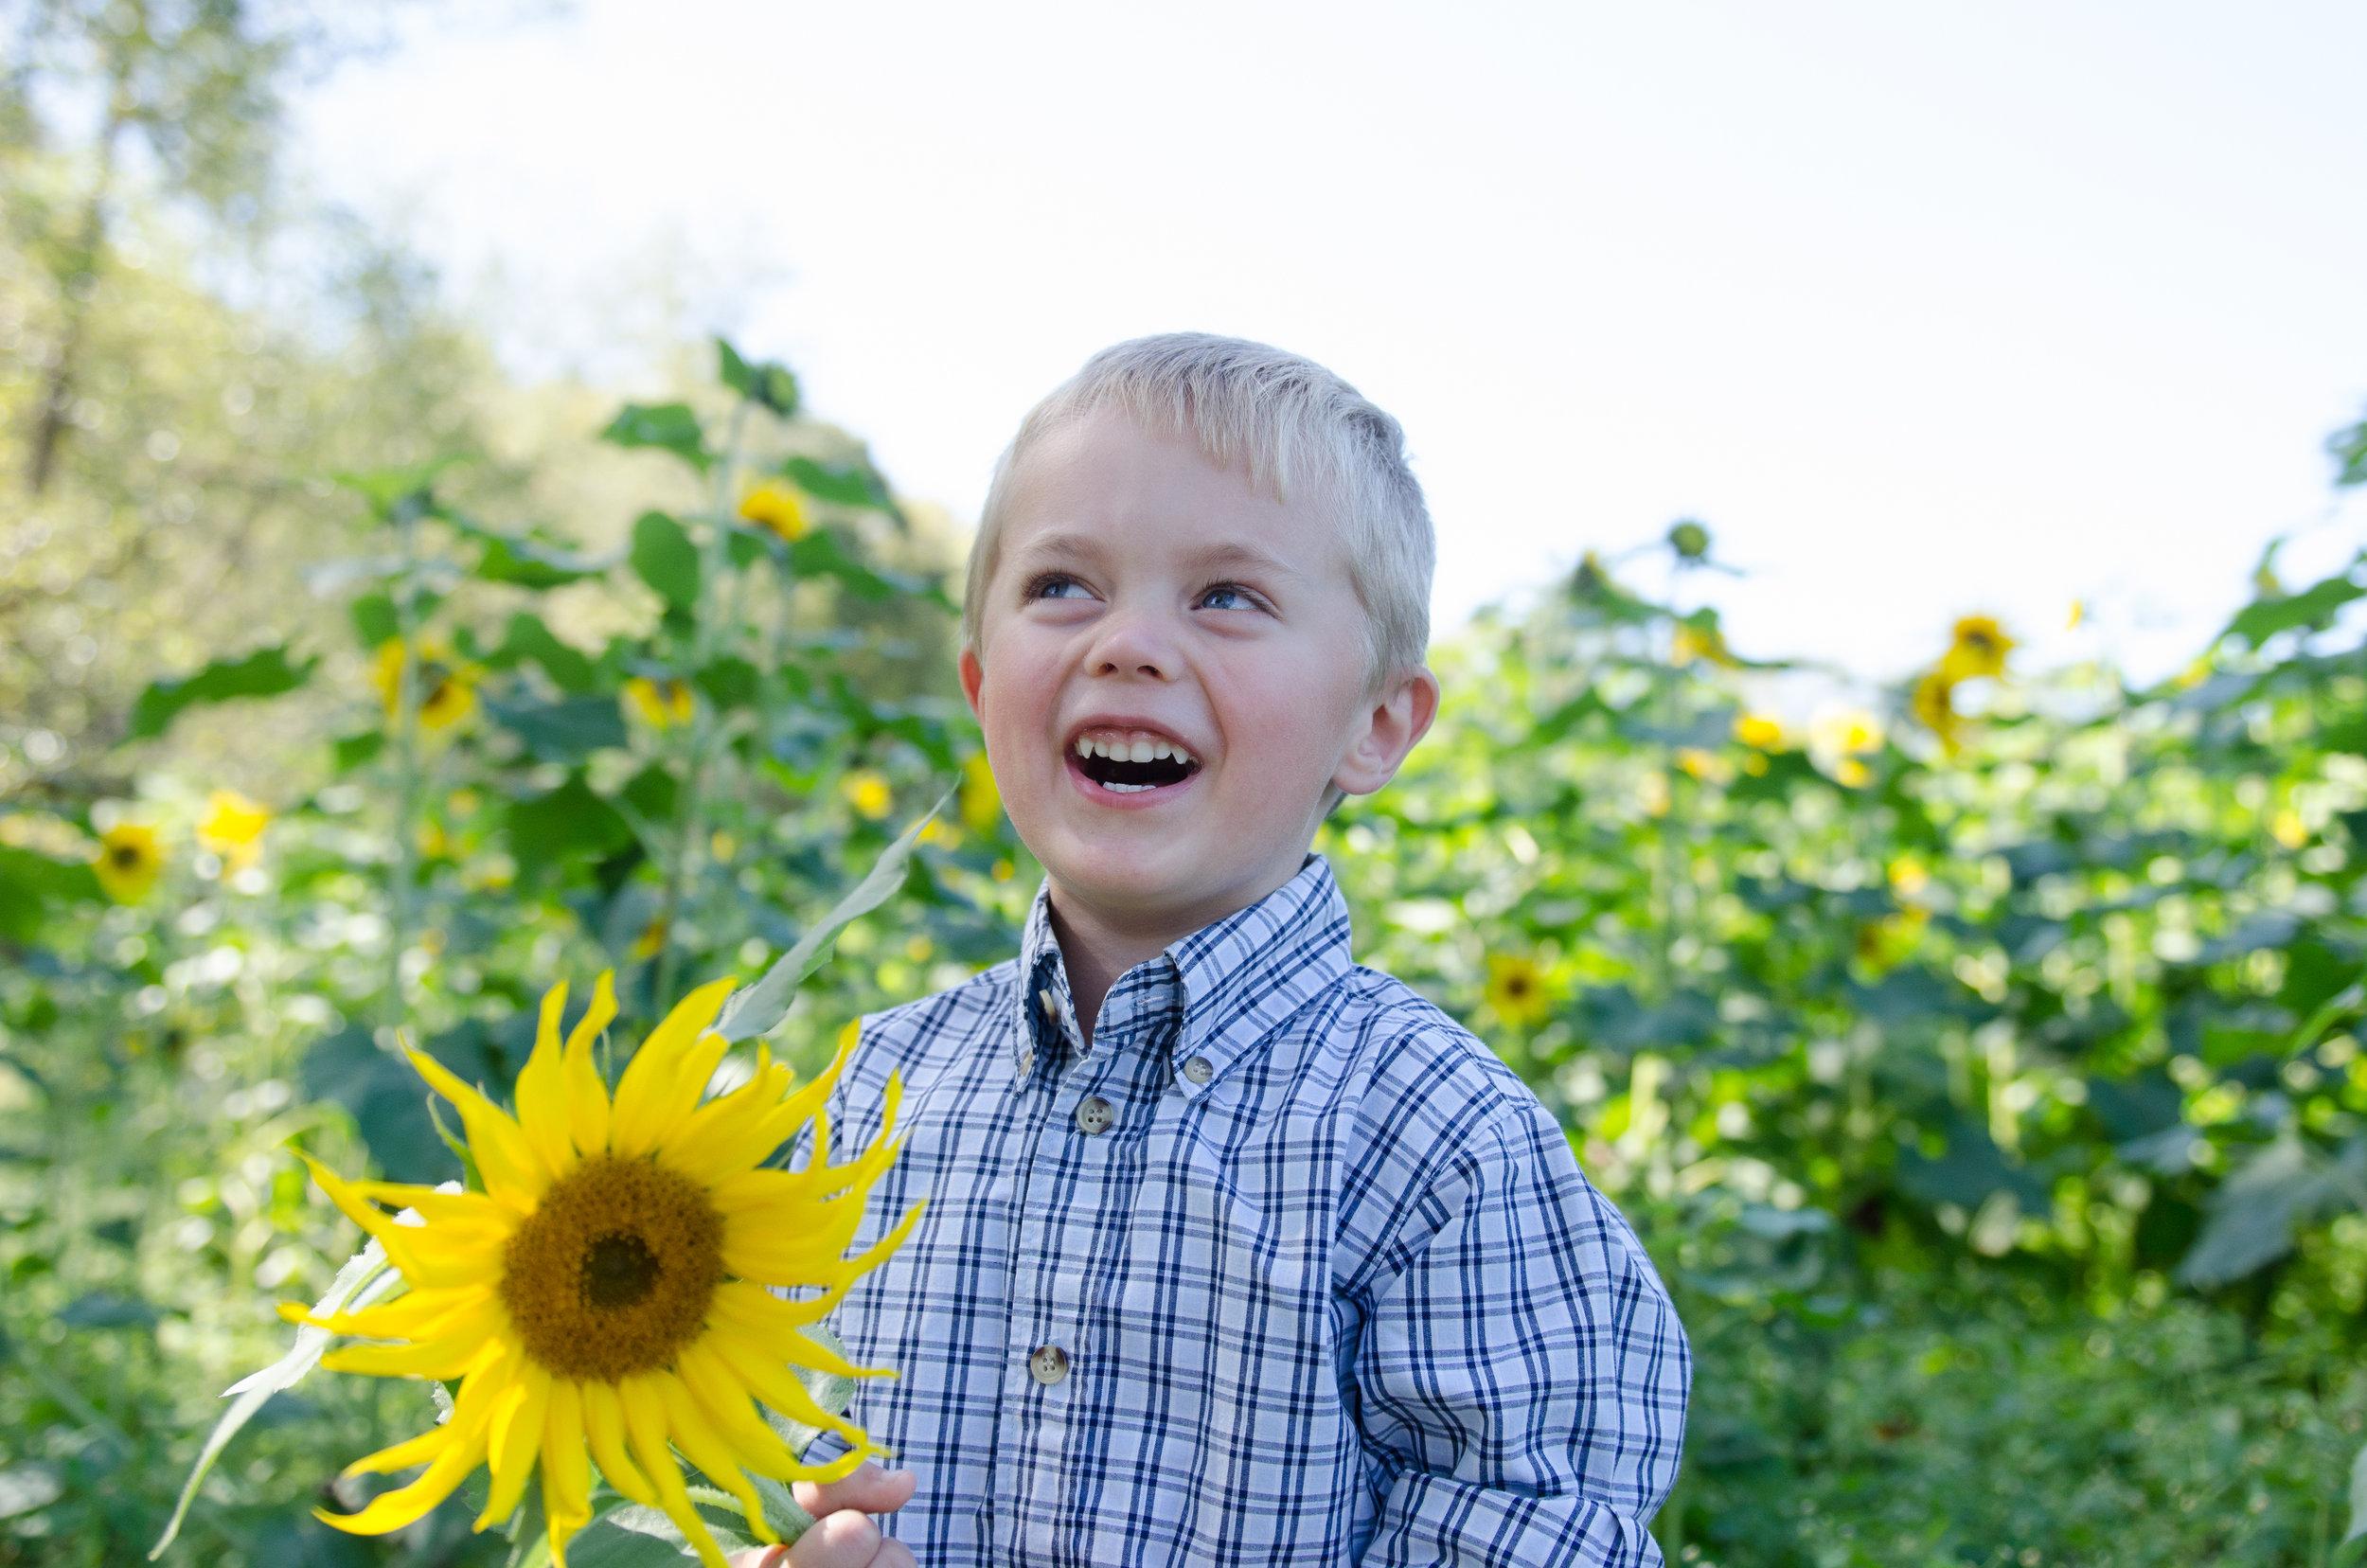 Sunflowers2017-3.jpg